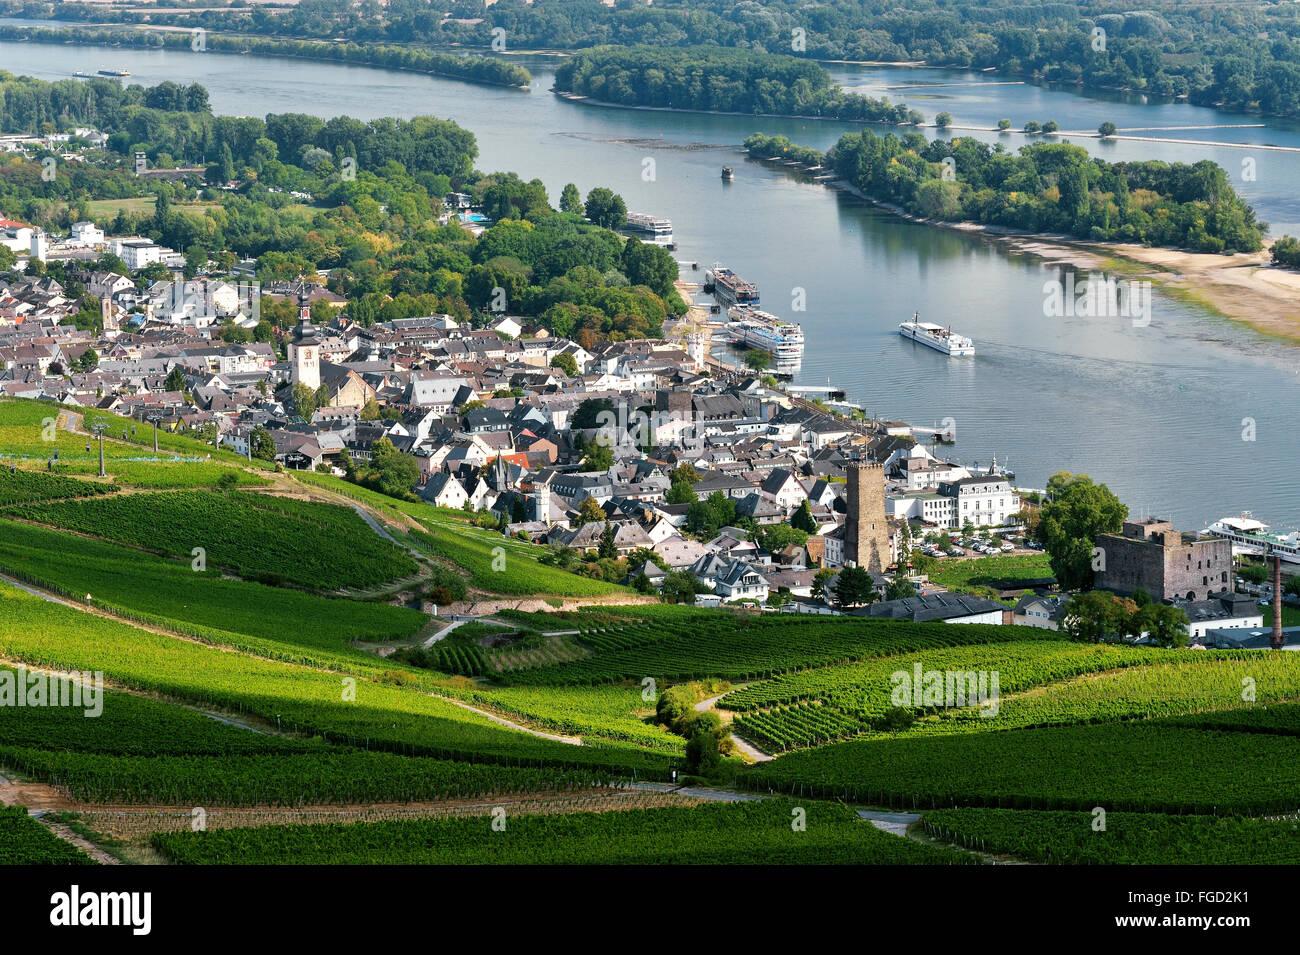 Rüdesheim am Rhein and vineyards, Upper Middle Rhine Valley, Germany Stock Photo